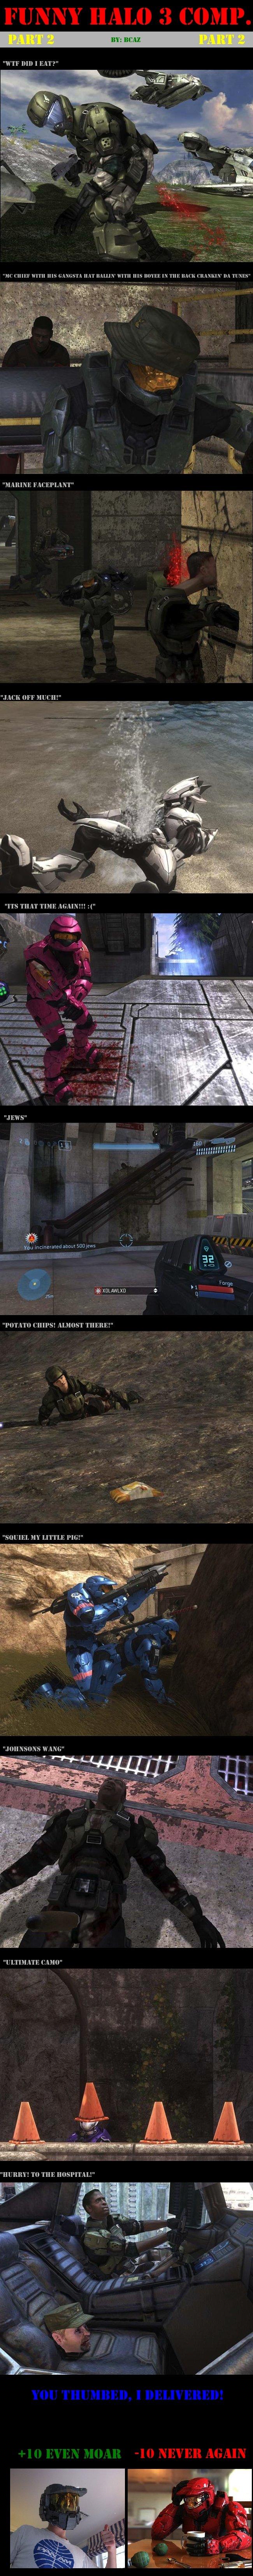 Halo 3 Comp. Part 2. PART 3:. Rev up those fryers cause OP posted decent content an...... Halo funny comp Covenant sucks Balls